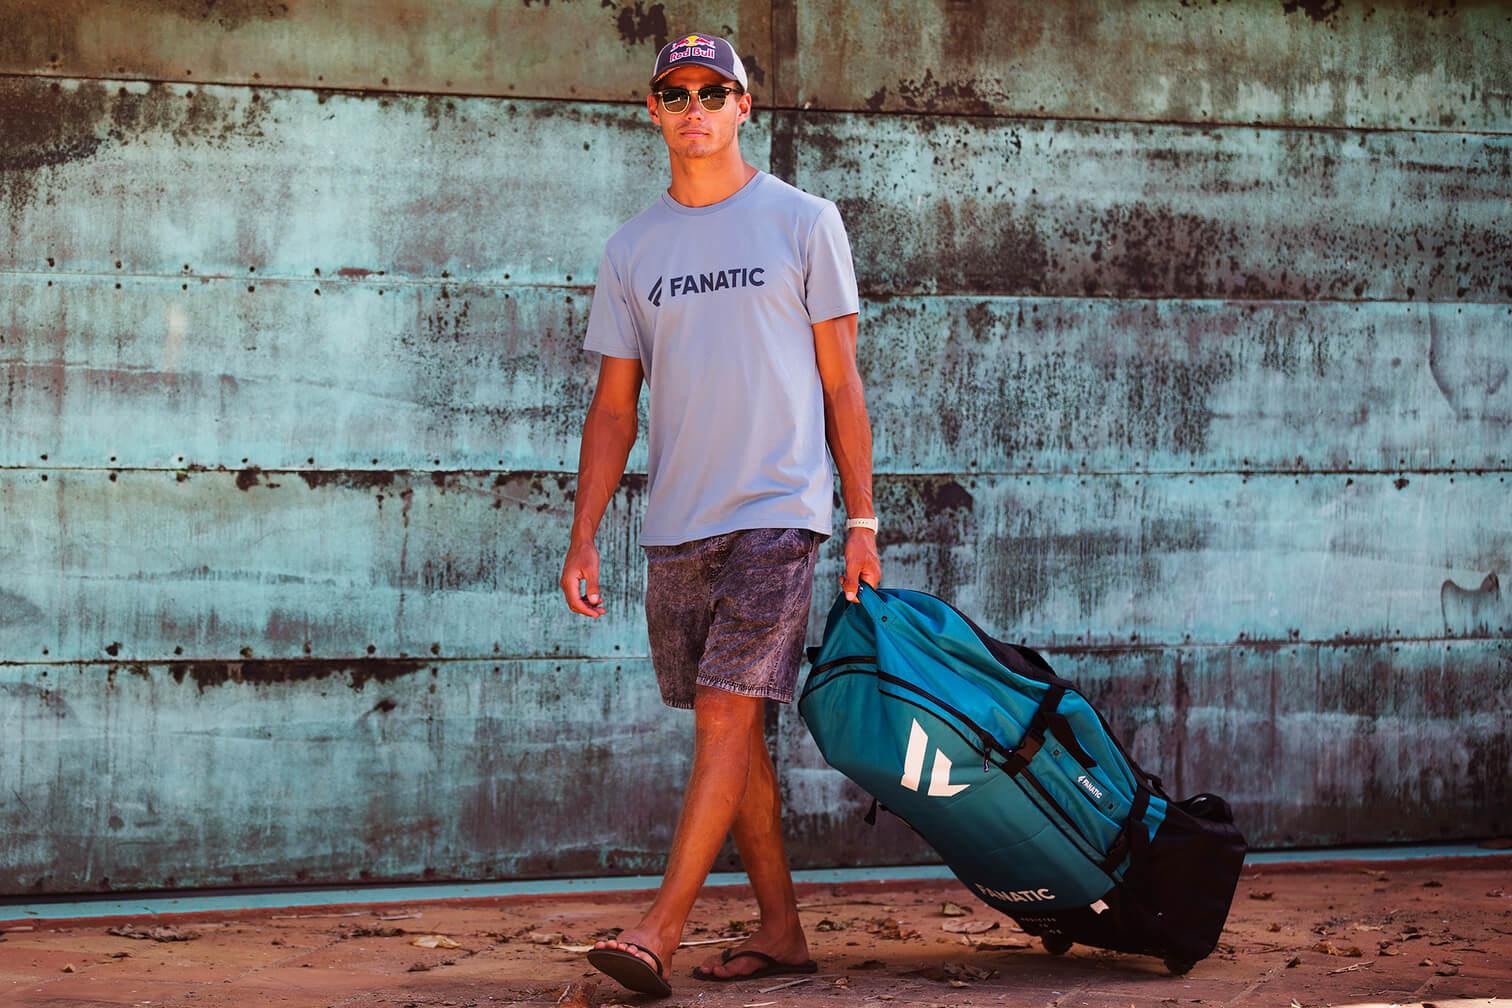 Arthur Backpack Promo LS JohnCarter-JC F19 Day12 D1 5013